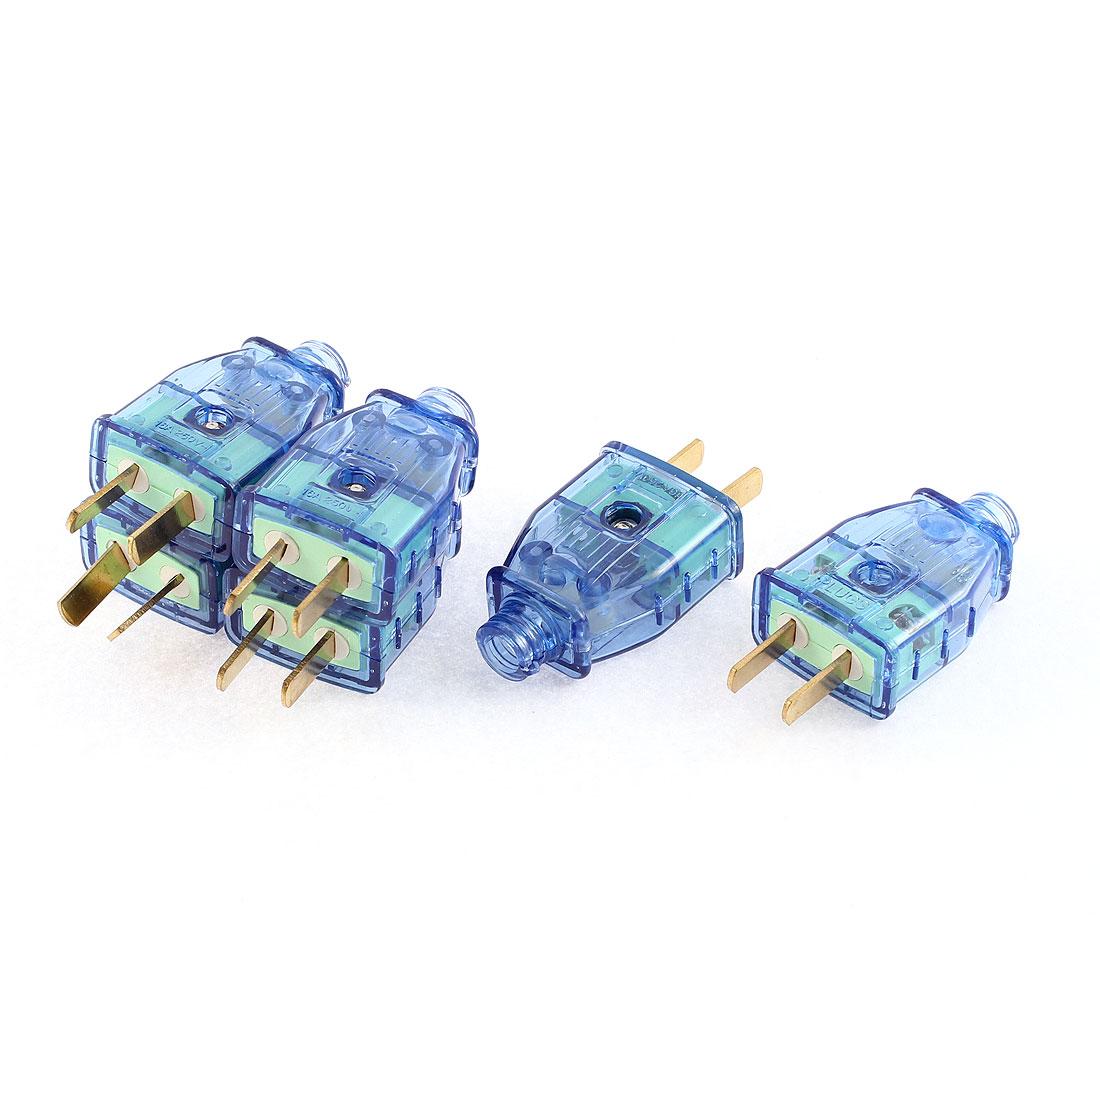 AC 250V 16A US AU Rotation Power Plug Adapter Connector 6 Pcs